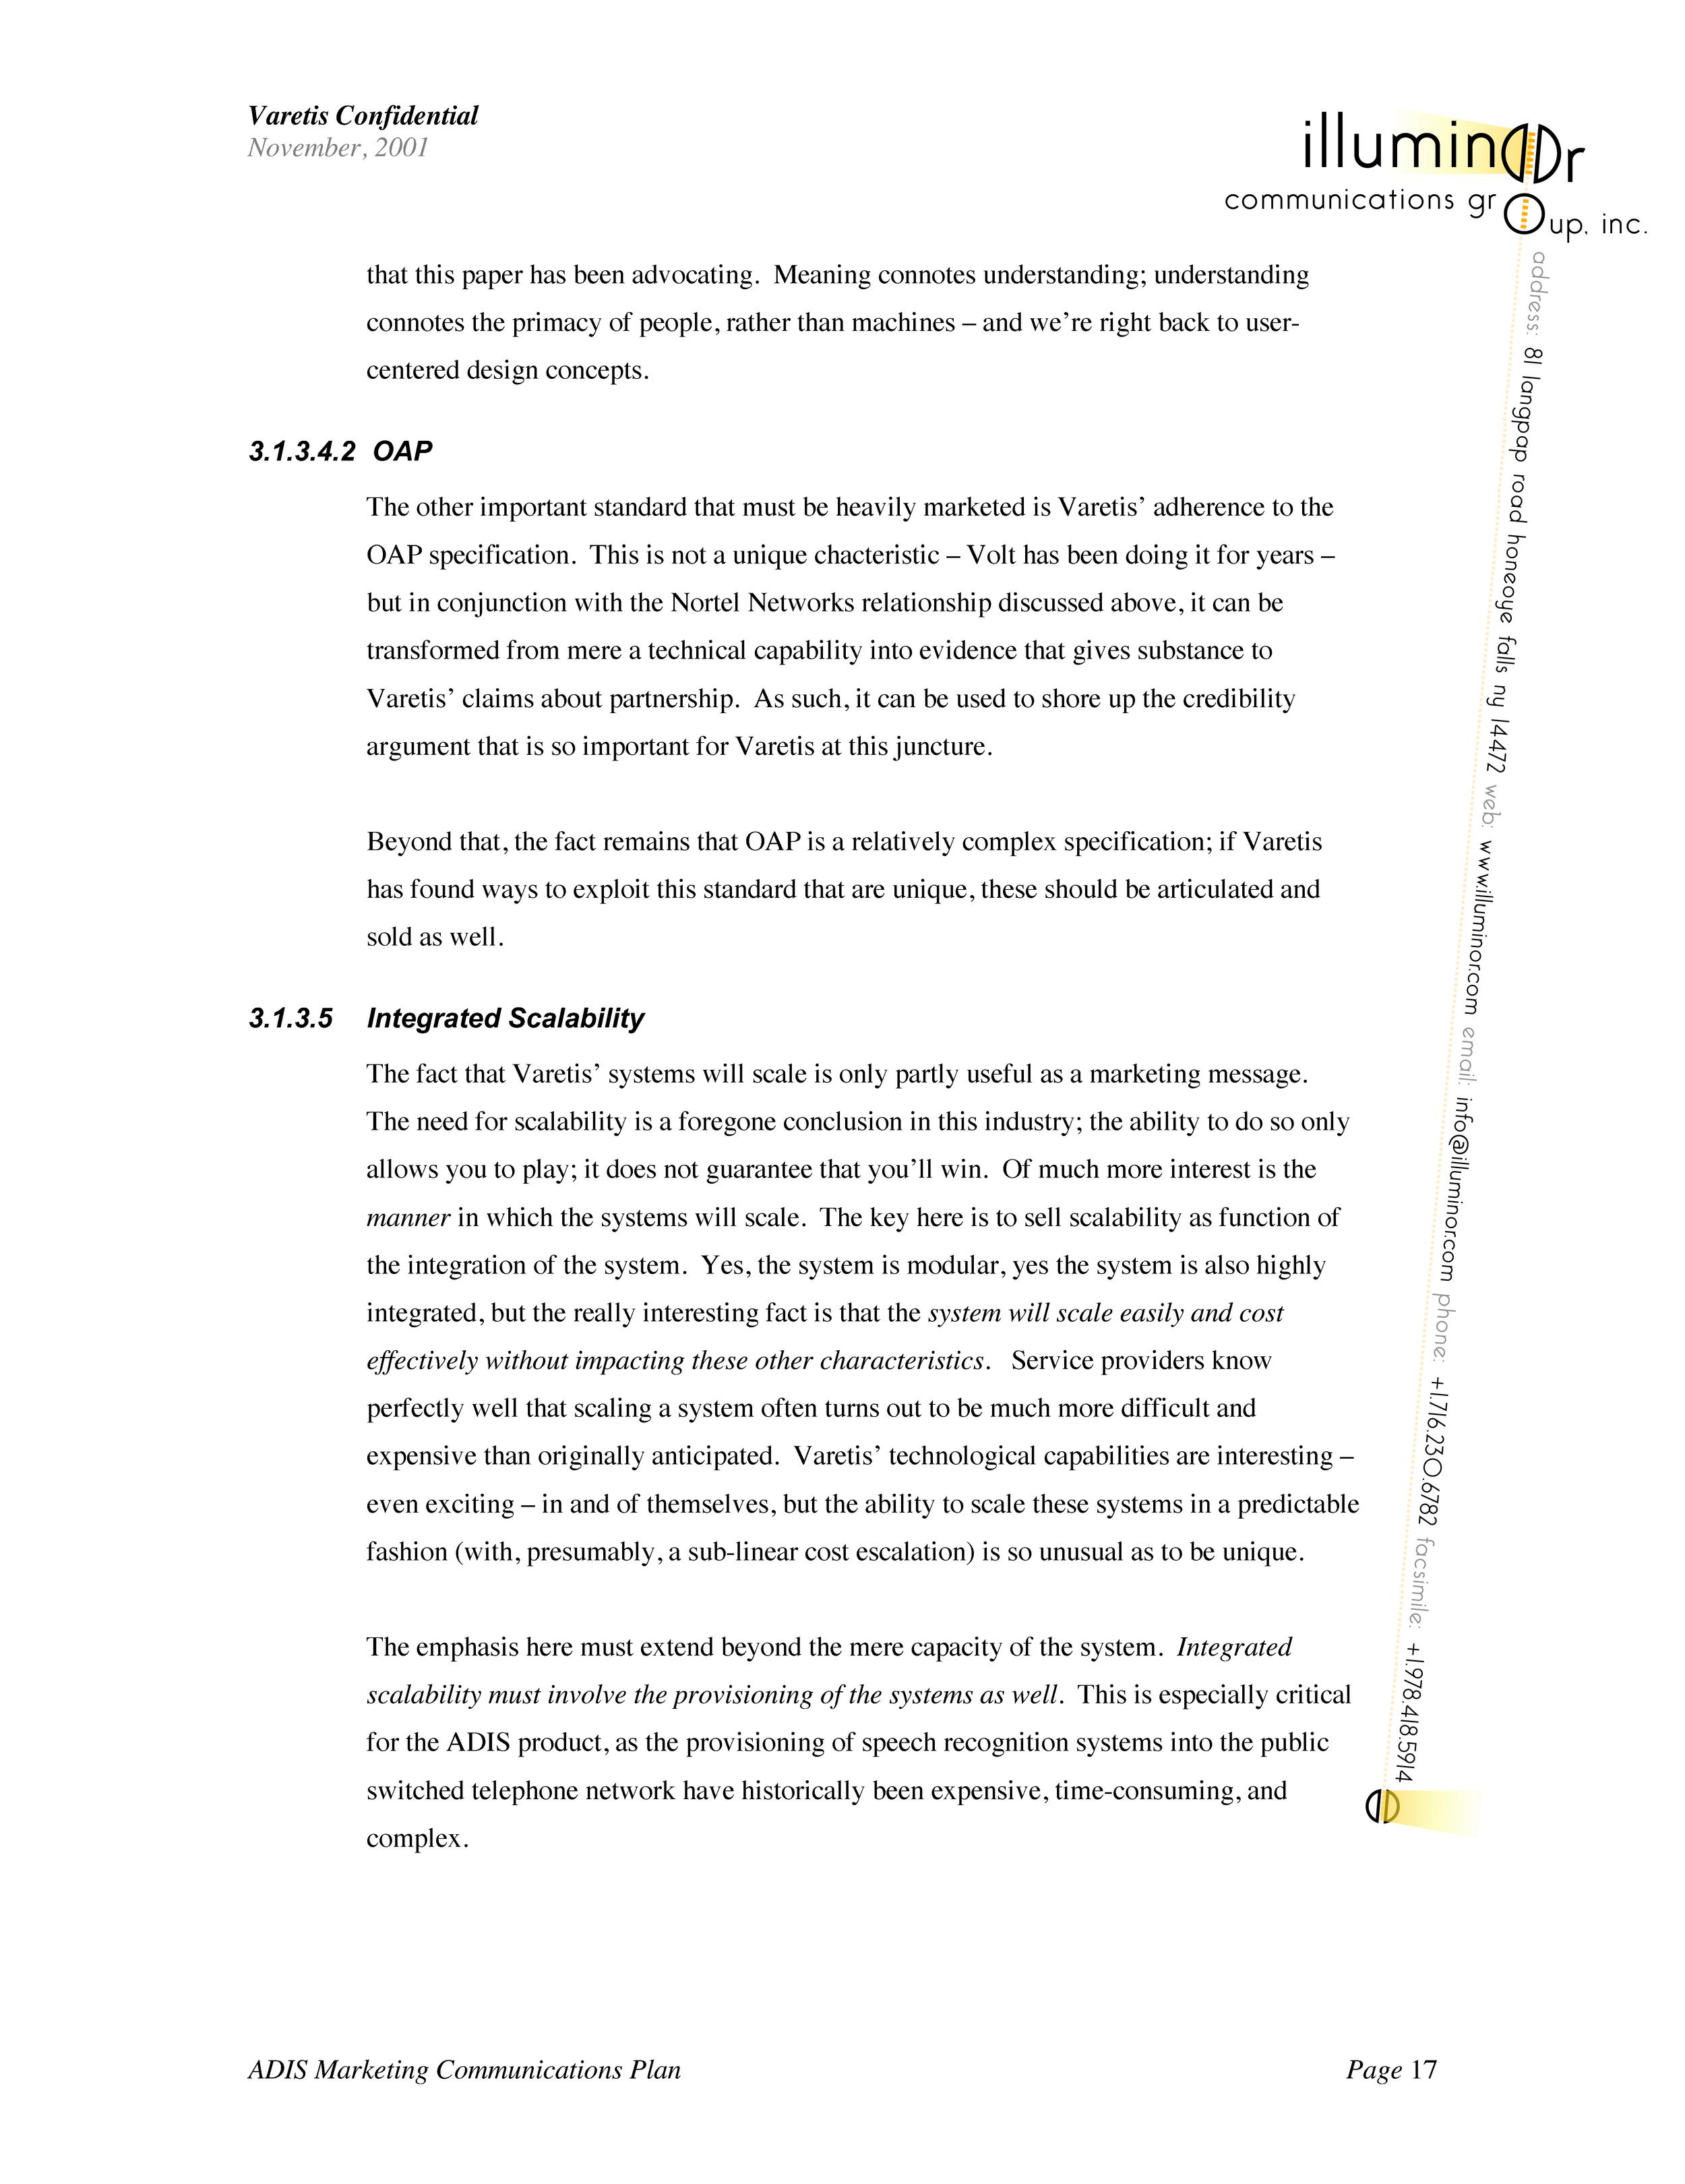 ADIS Marcomm Plan_Page_17.png